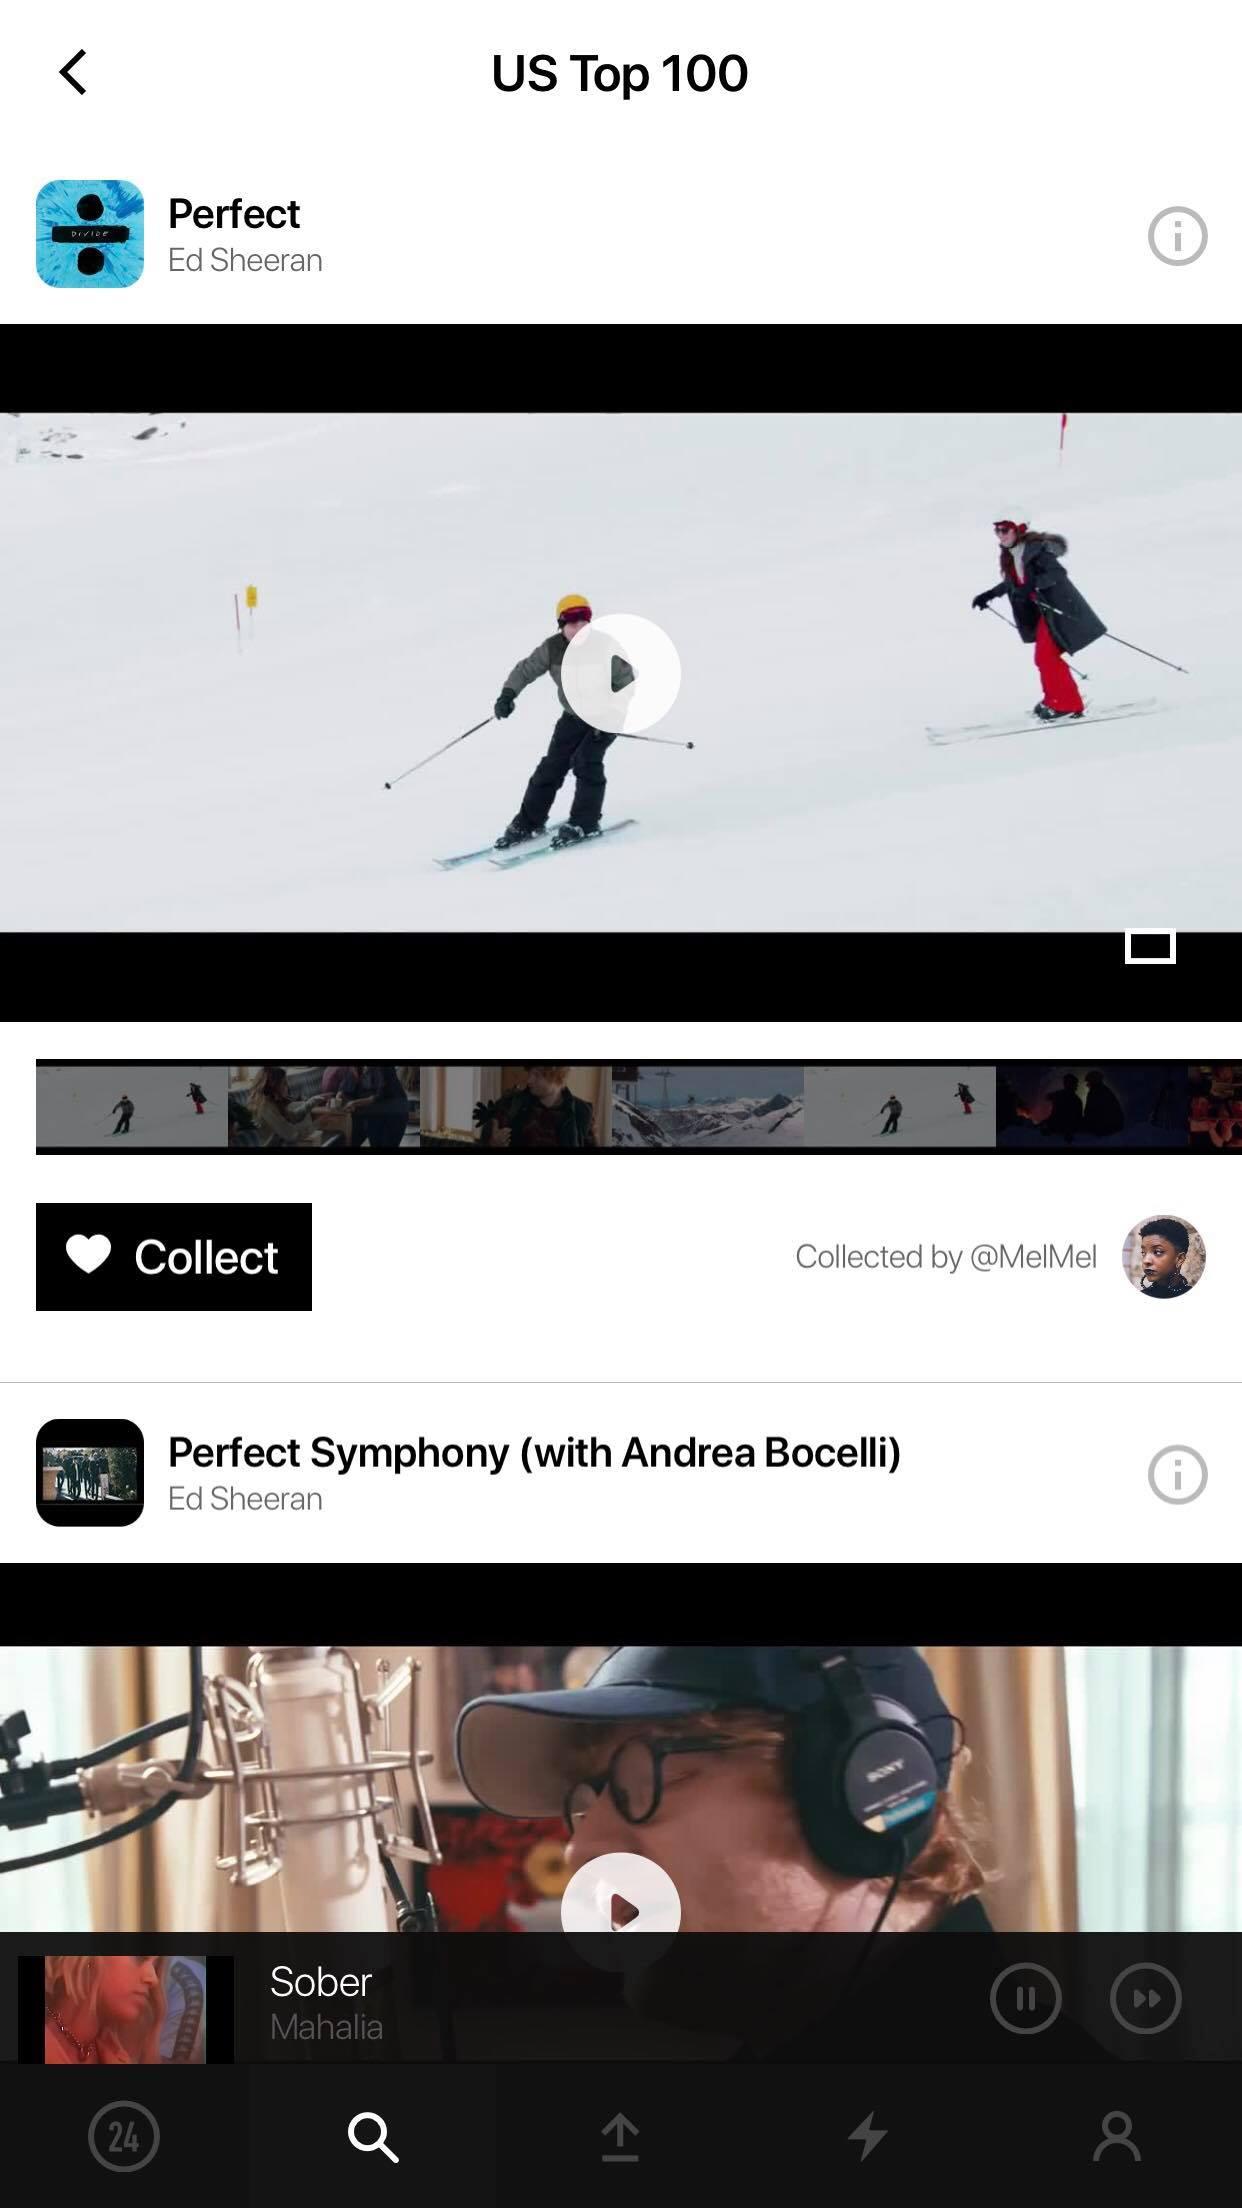 VIBBIDI COLLECT SONG MUSIC APP